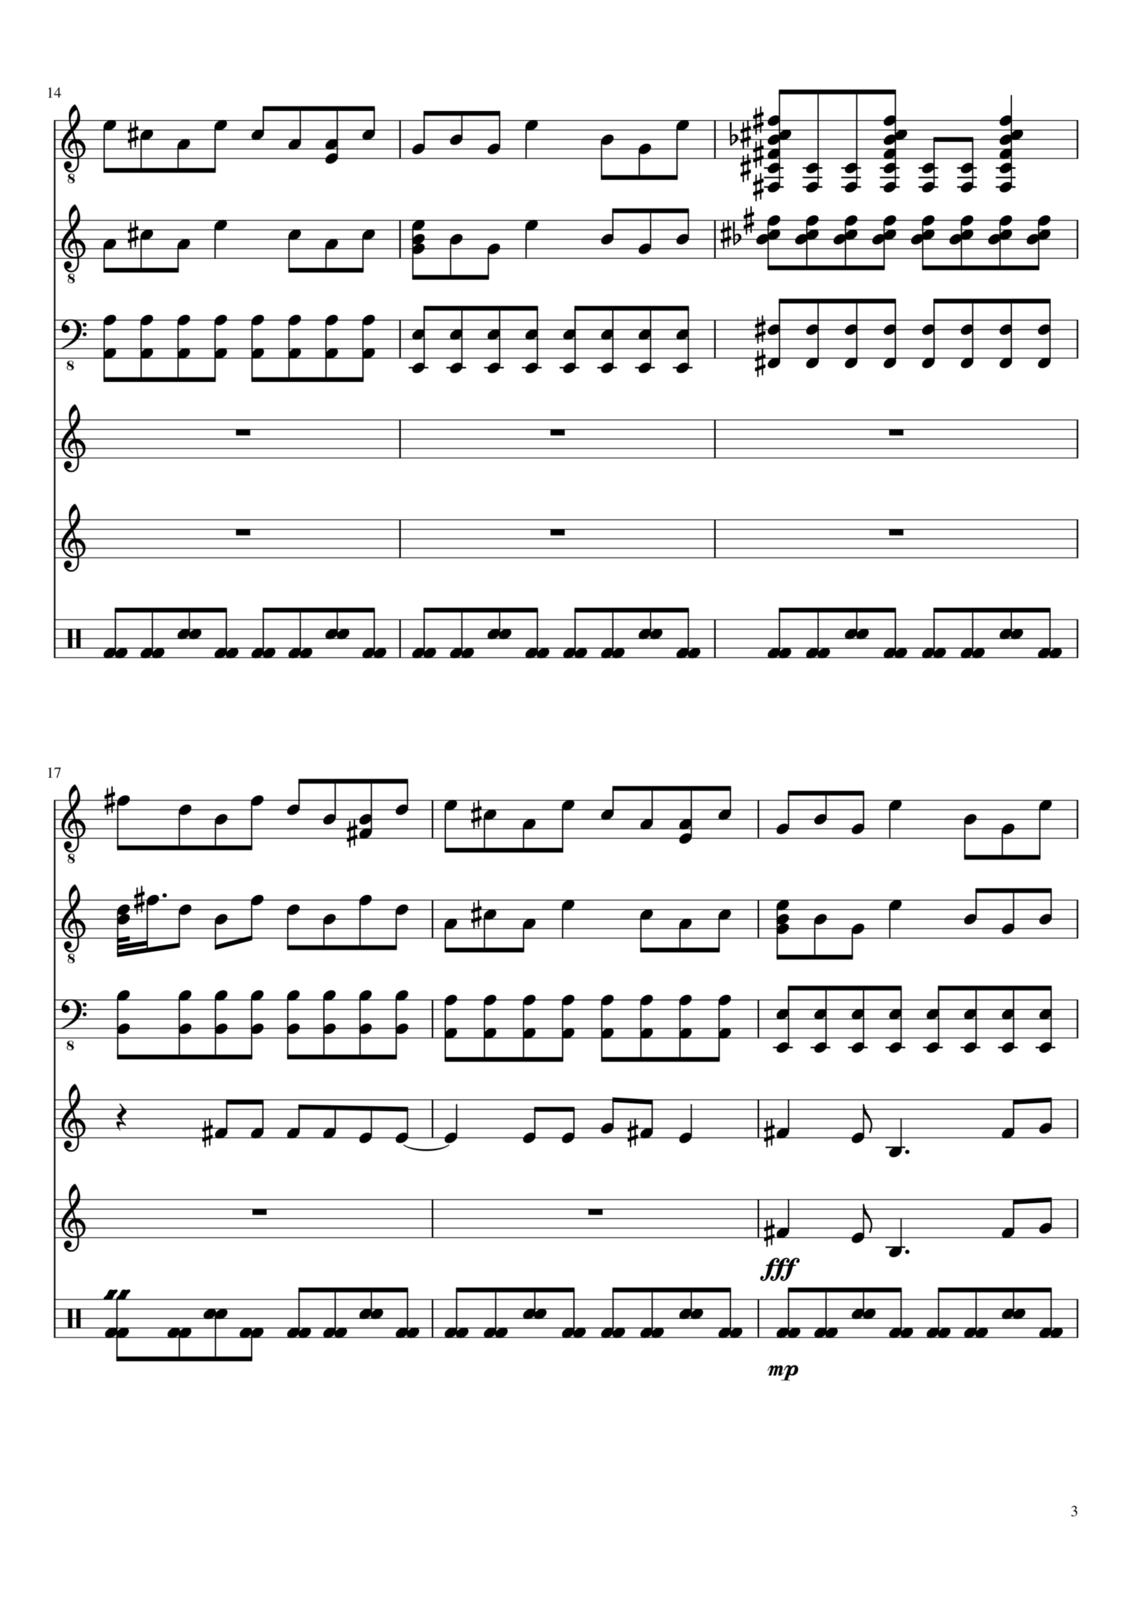 Ot Bolshogo Uma slide, Image 3